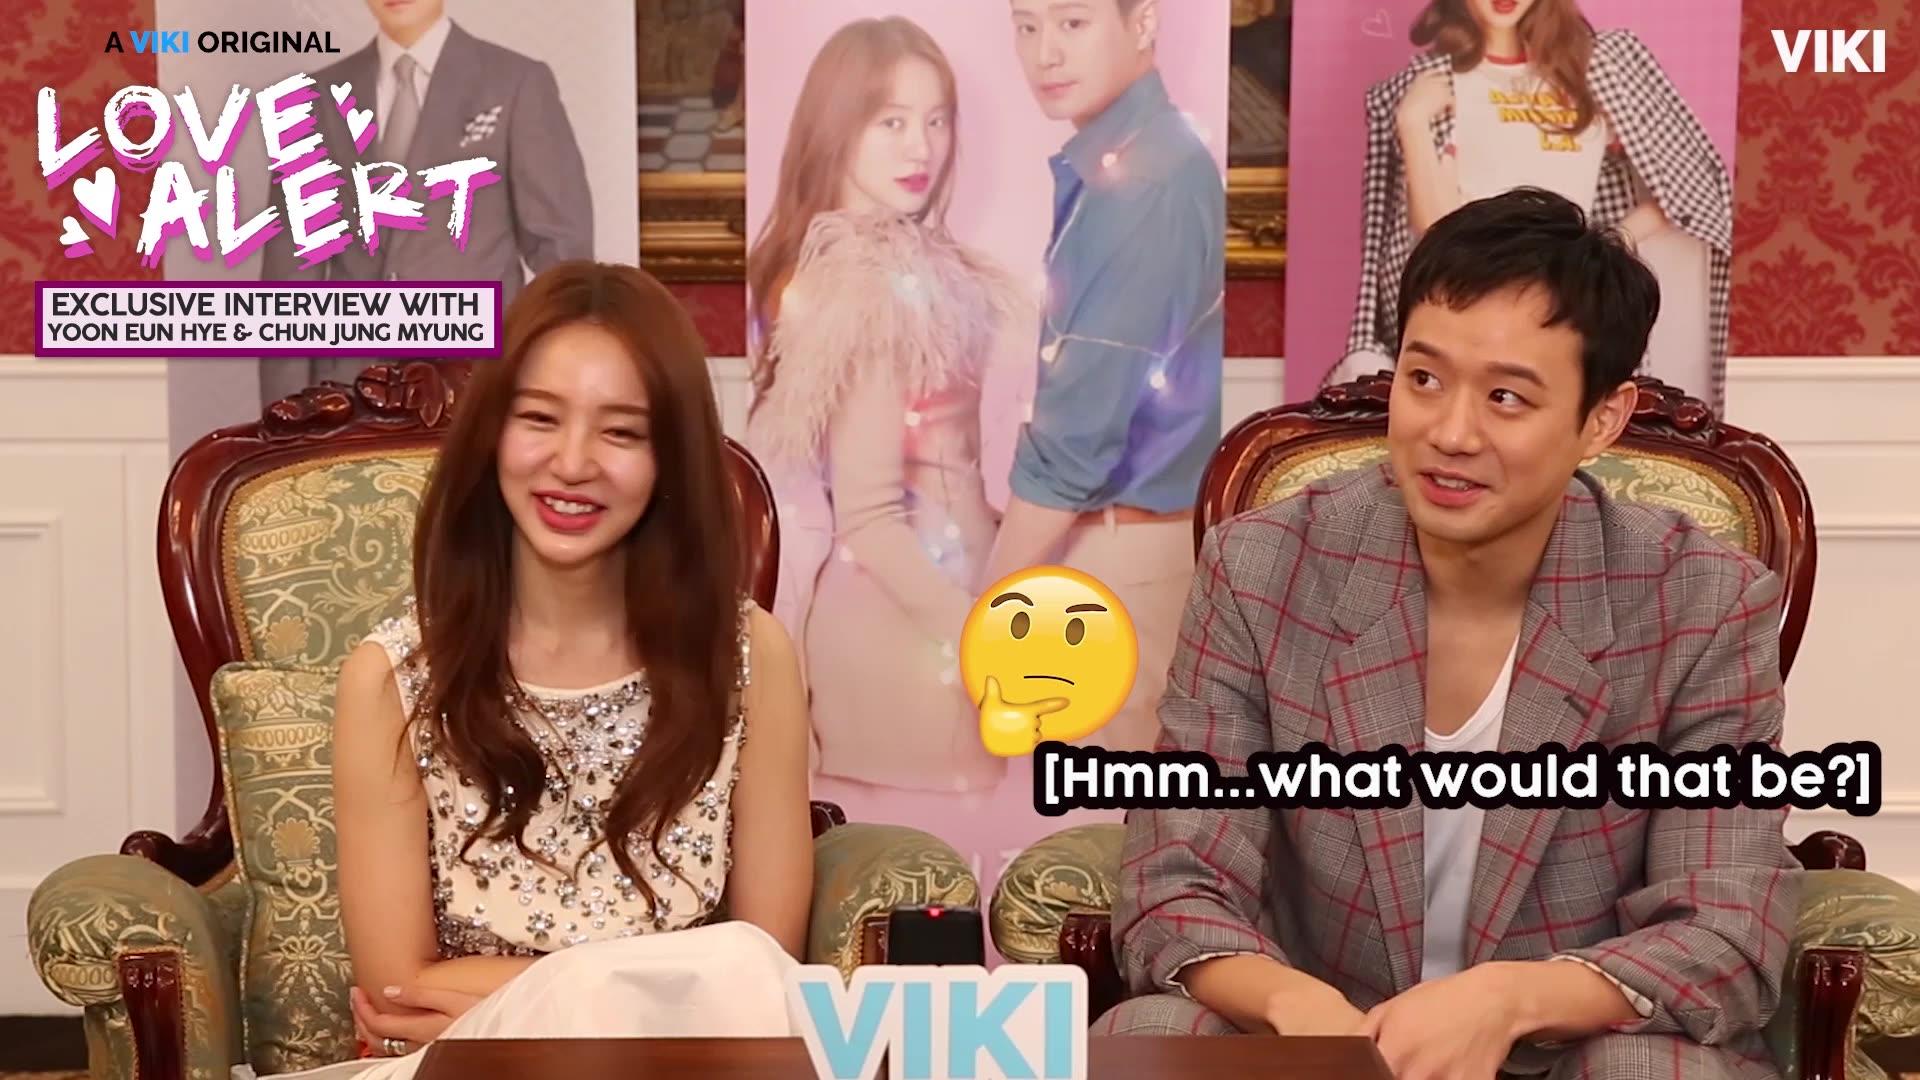 Yoon Eun Hye & Chun Jung Myung's Chemistry: Alerta de amor